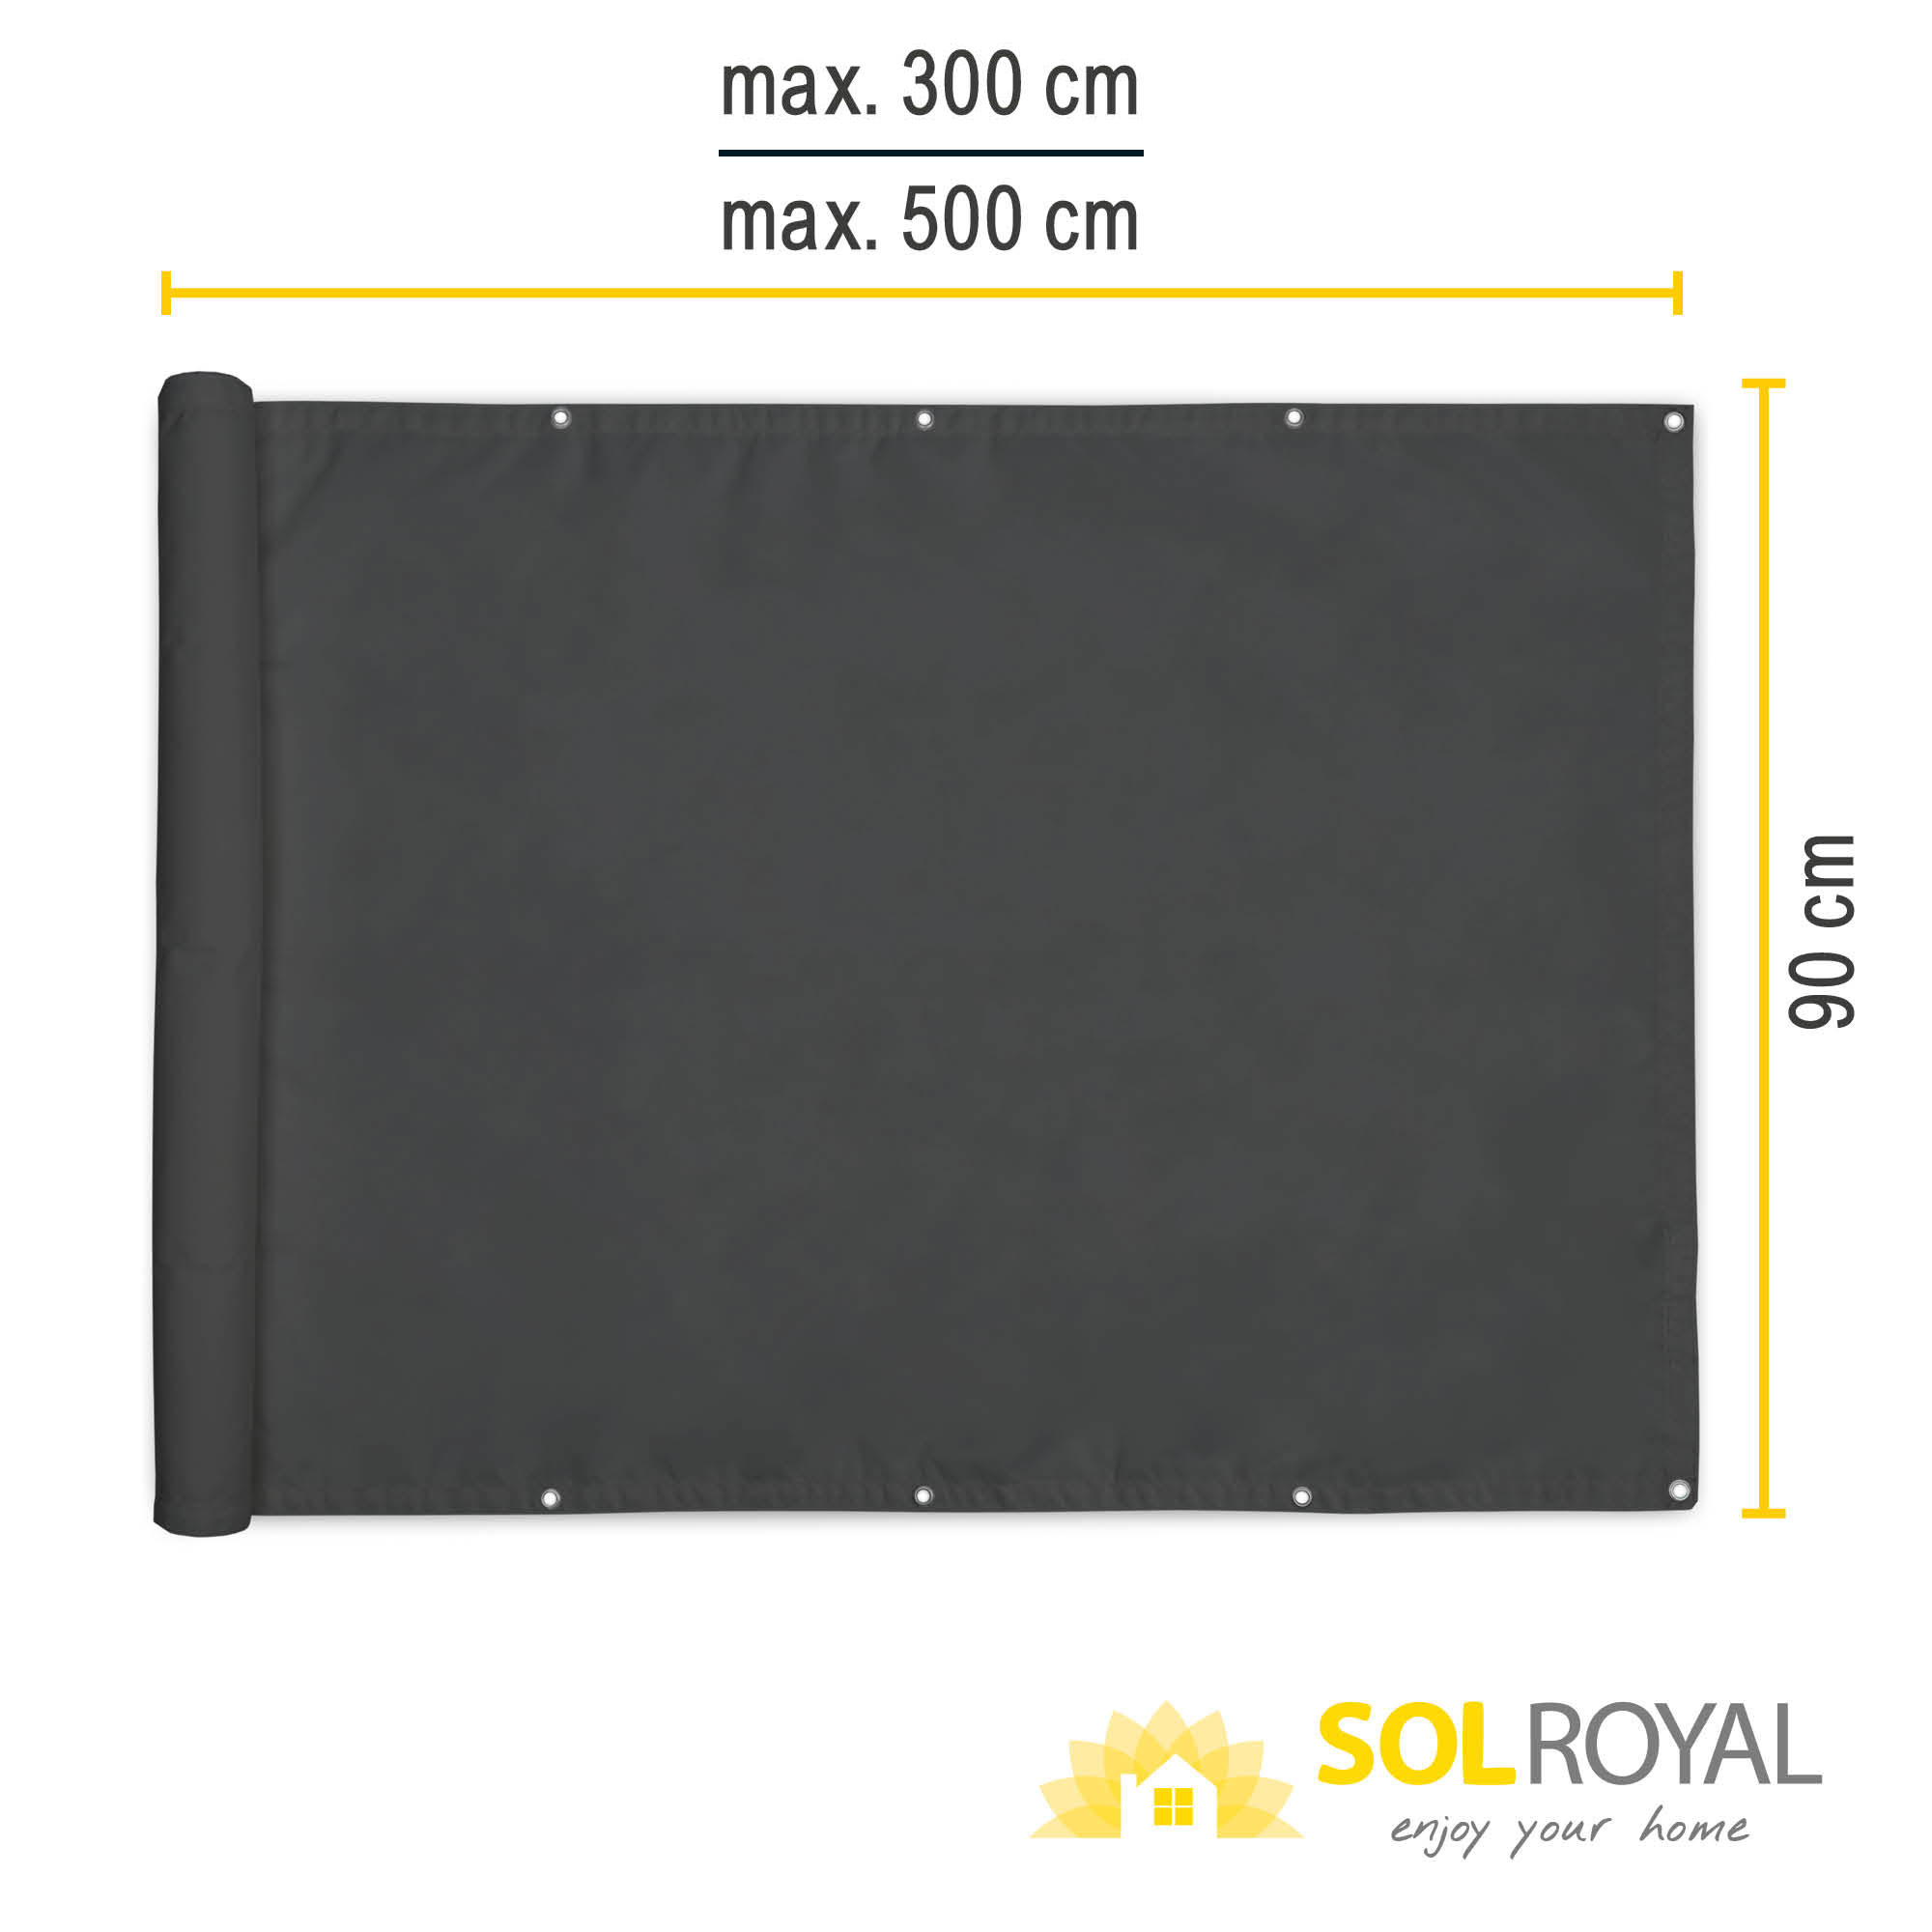 Balkon Sichtschutz Balkonsichtschutz Zaun Windschutz Balkonumspannung PES Matte